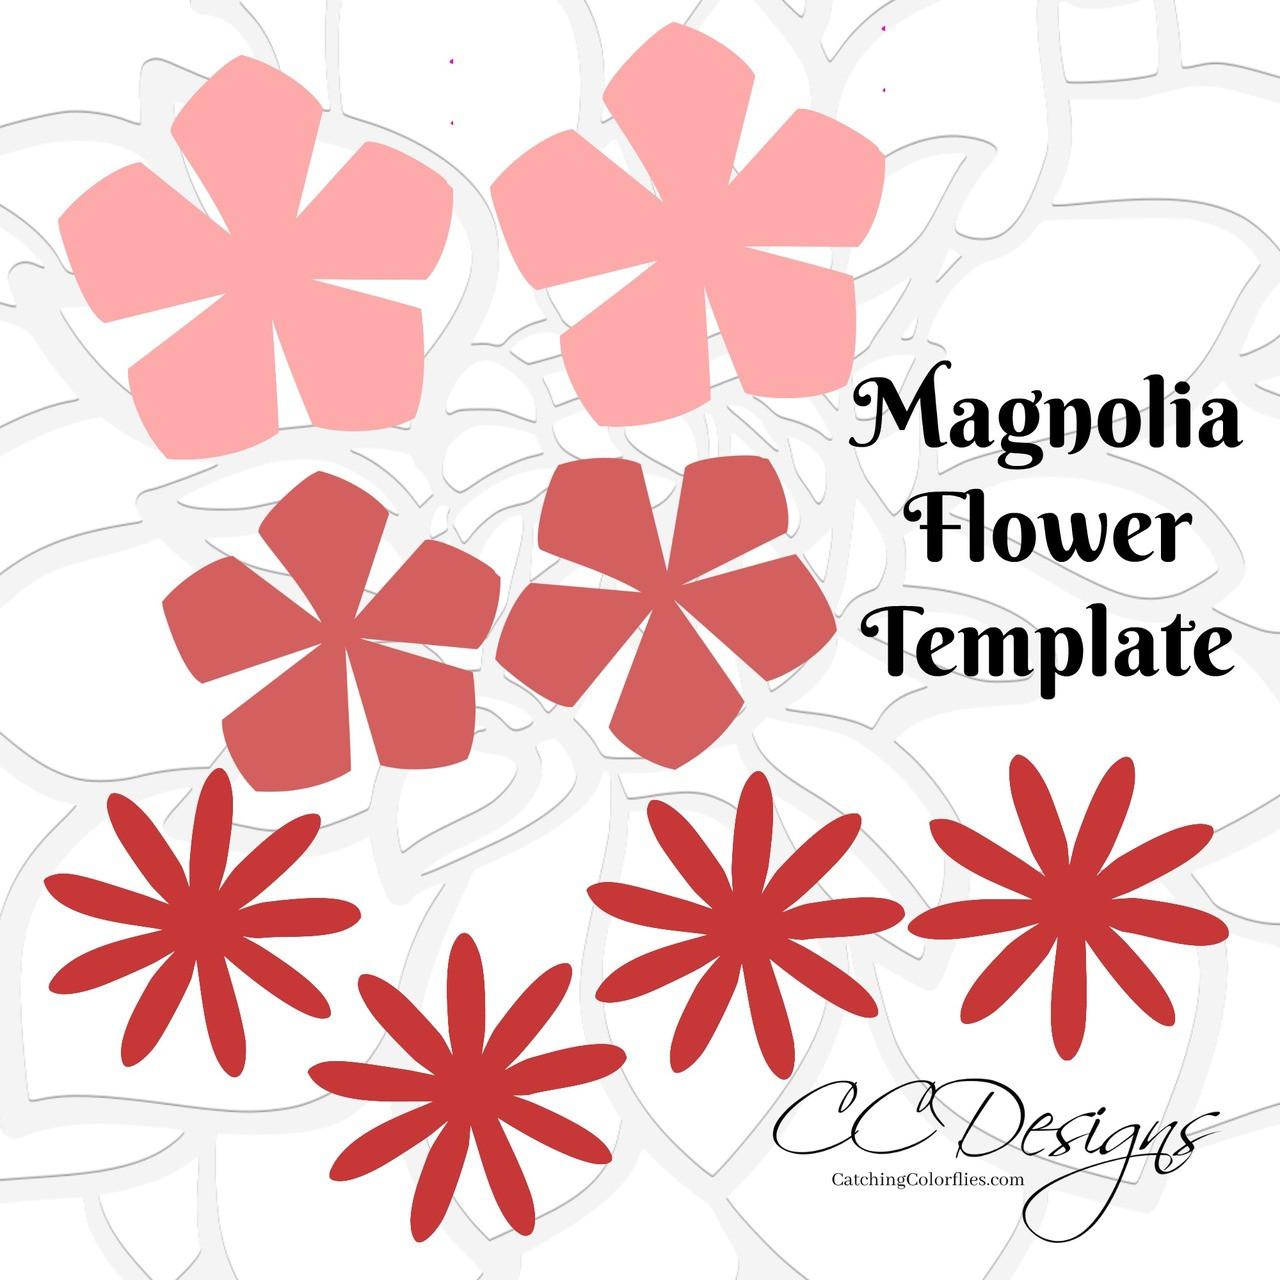 Magnolia paper flower template catching colorlfies digital download magnolia paper flower template maxwellsz